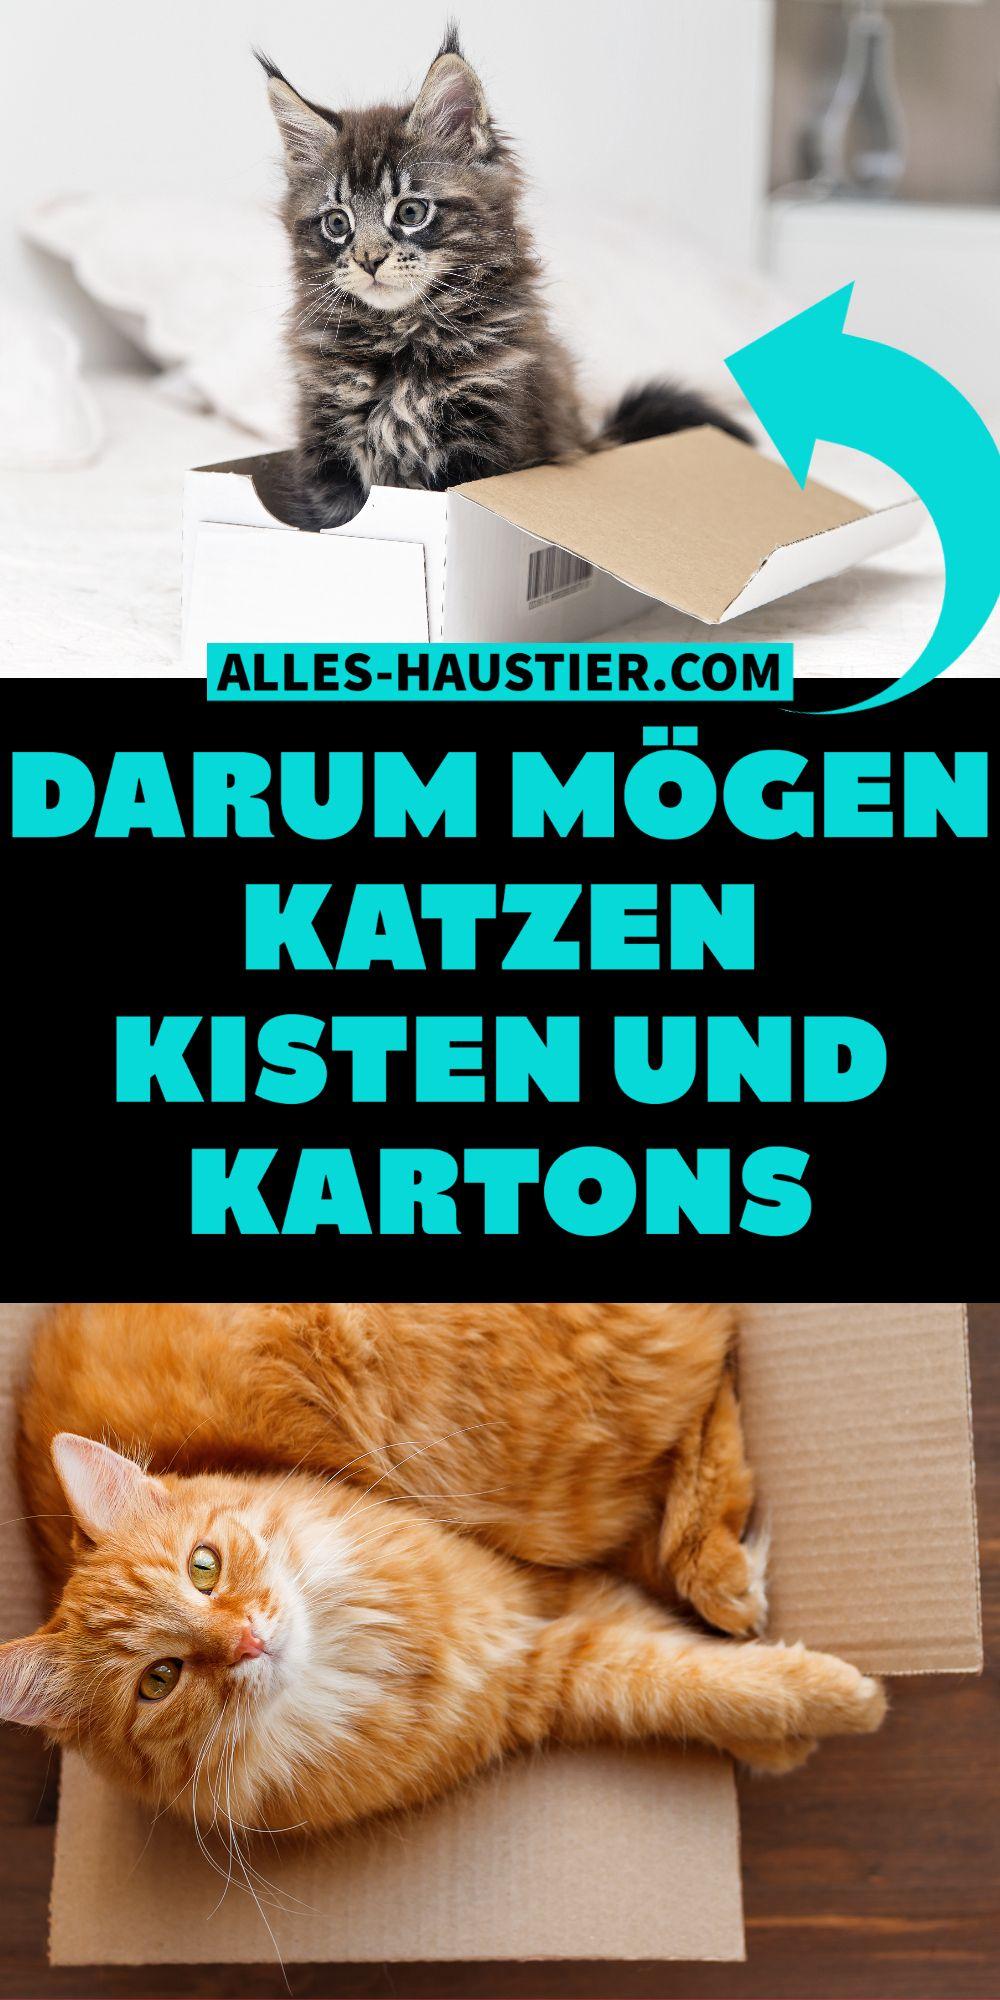 Warum Mögen Katzen Kartons